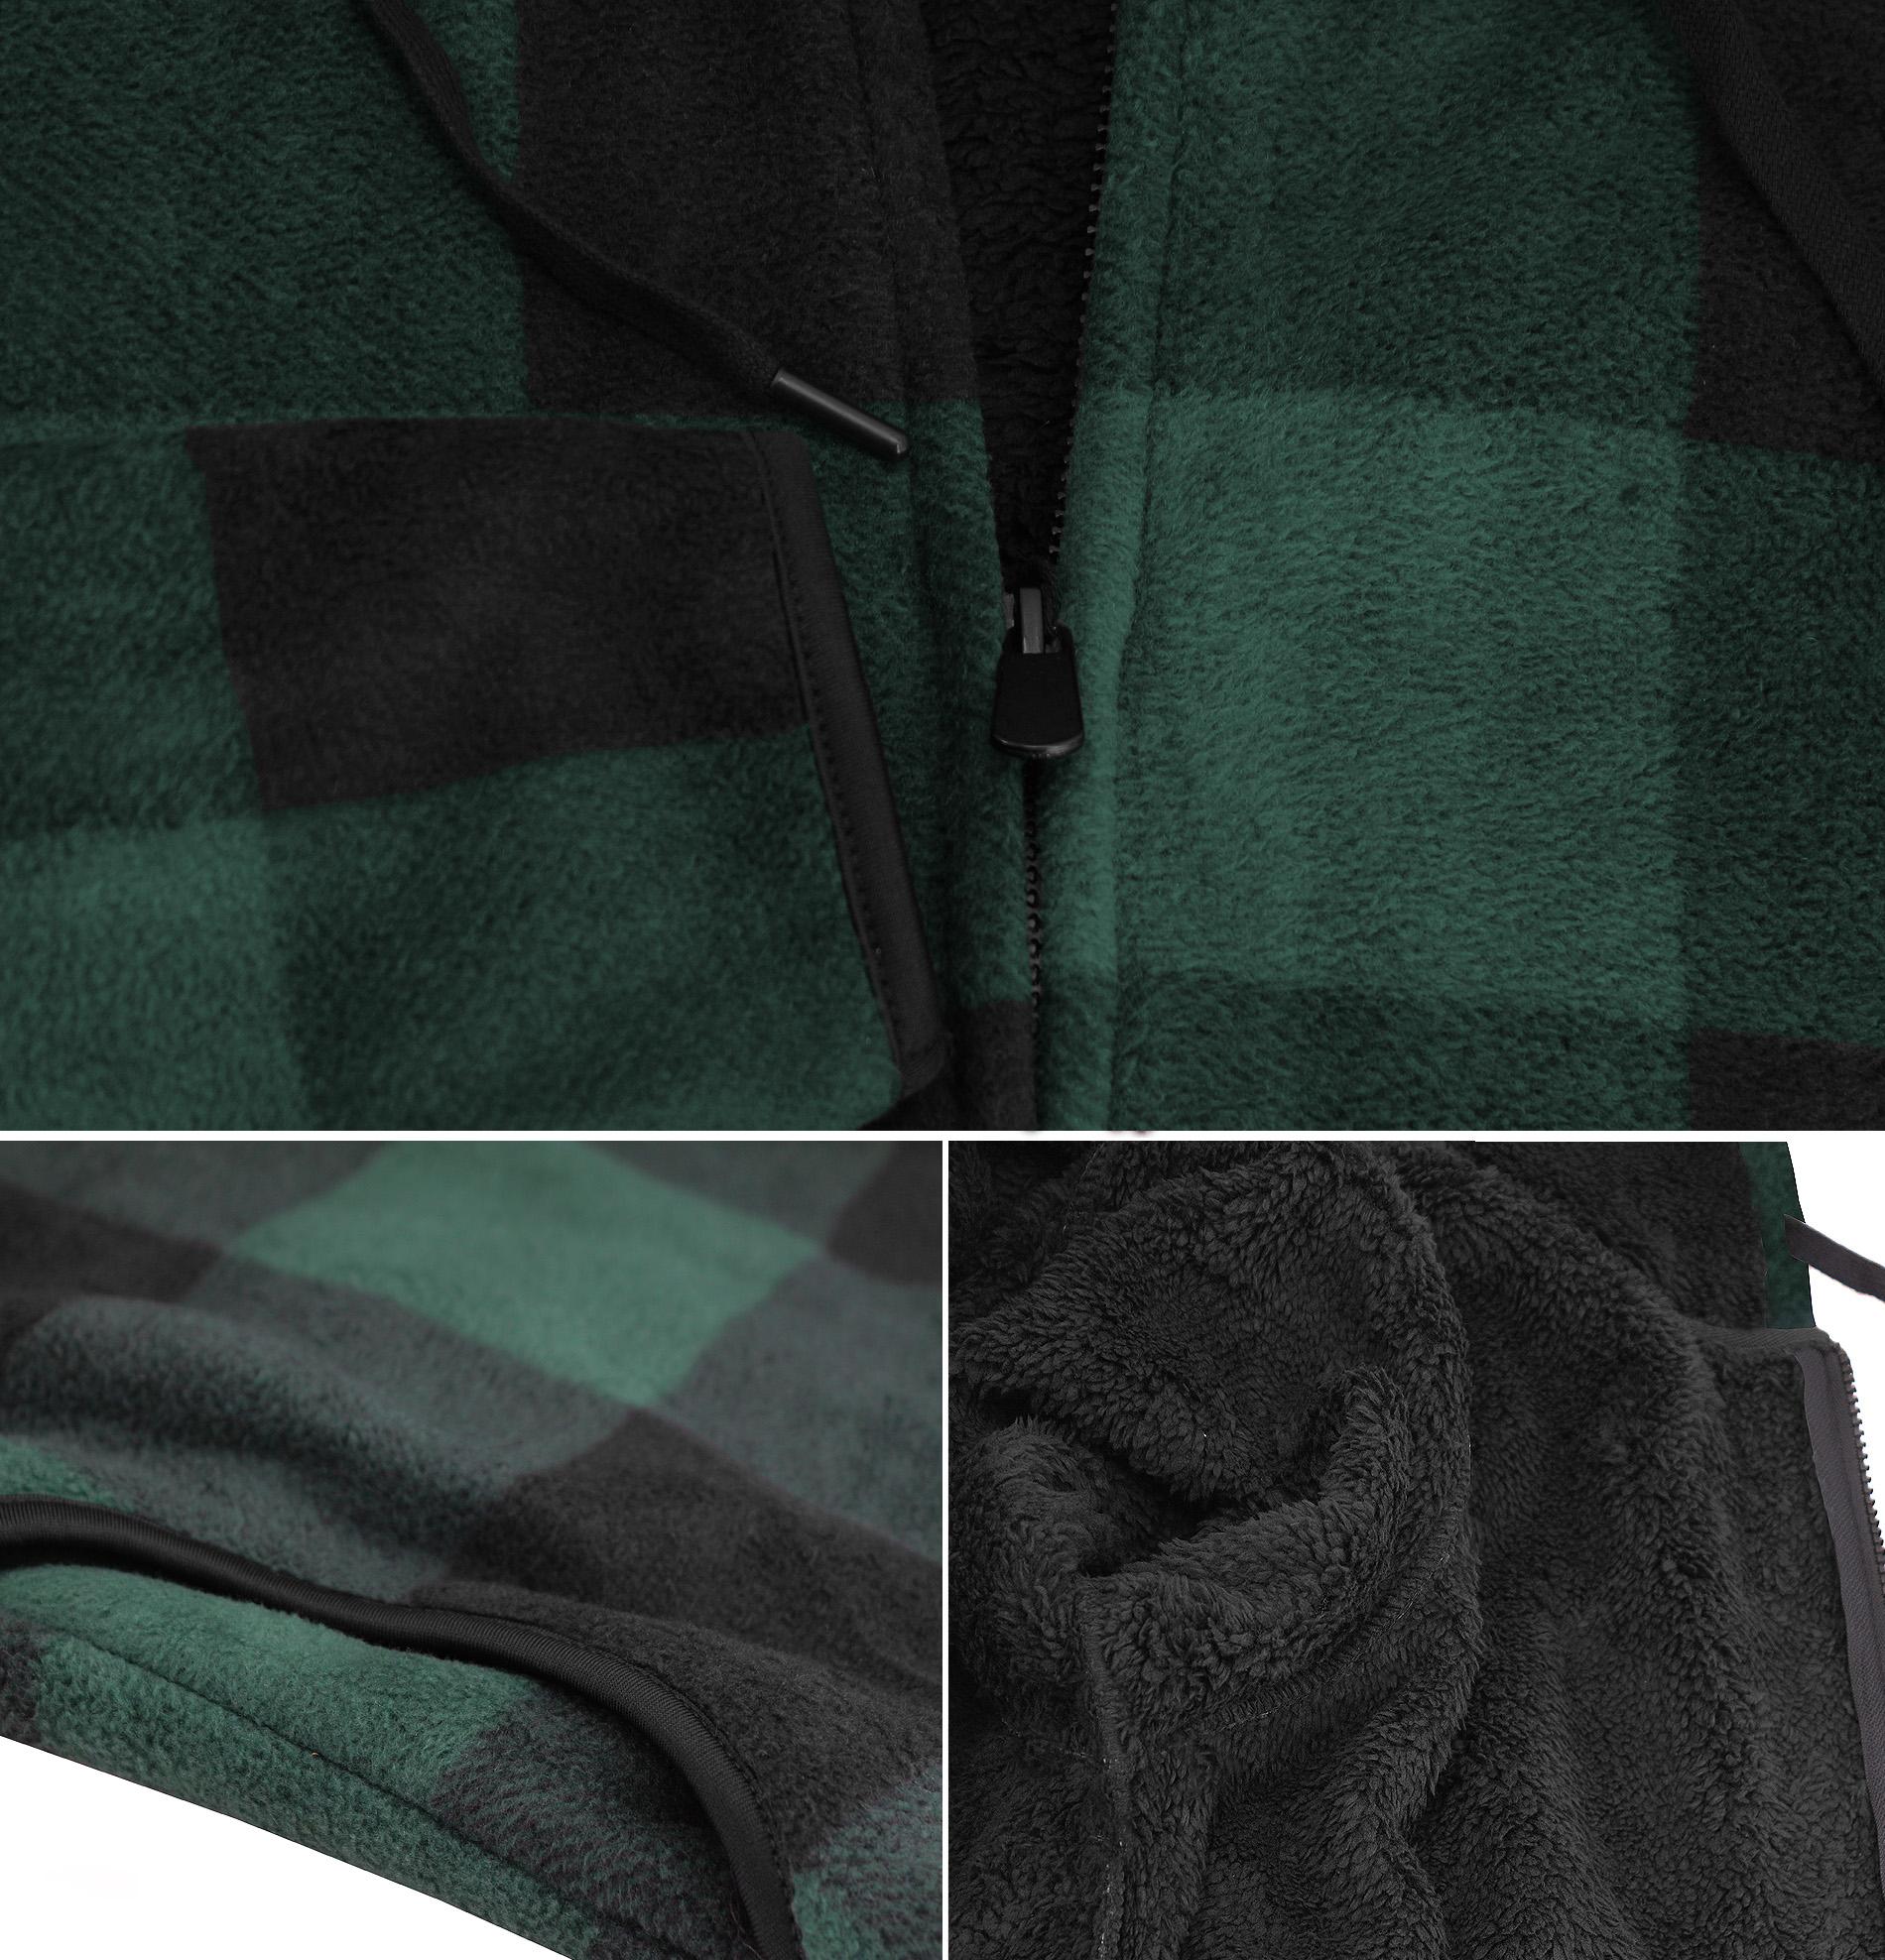 thumbnail 7 - Men-039-s-Casual-Flannel-Zip-Up-Fleece-Lined-Plaid-Sherpa-Hoodie-Lightweight-Jacket